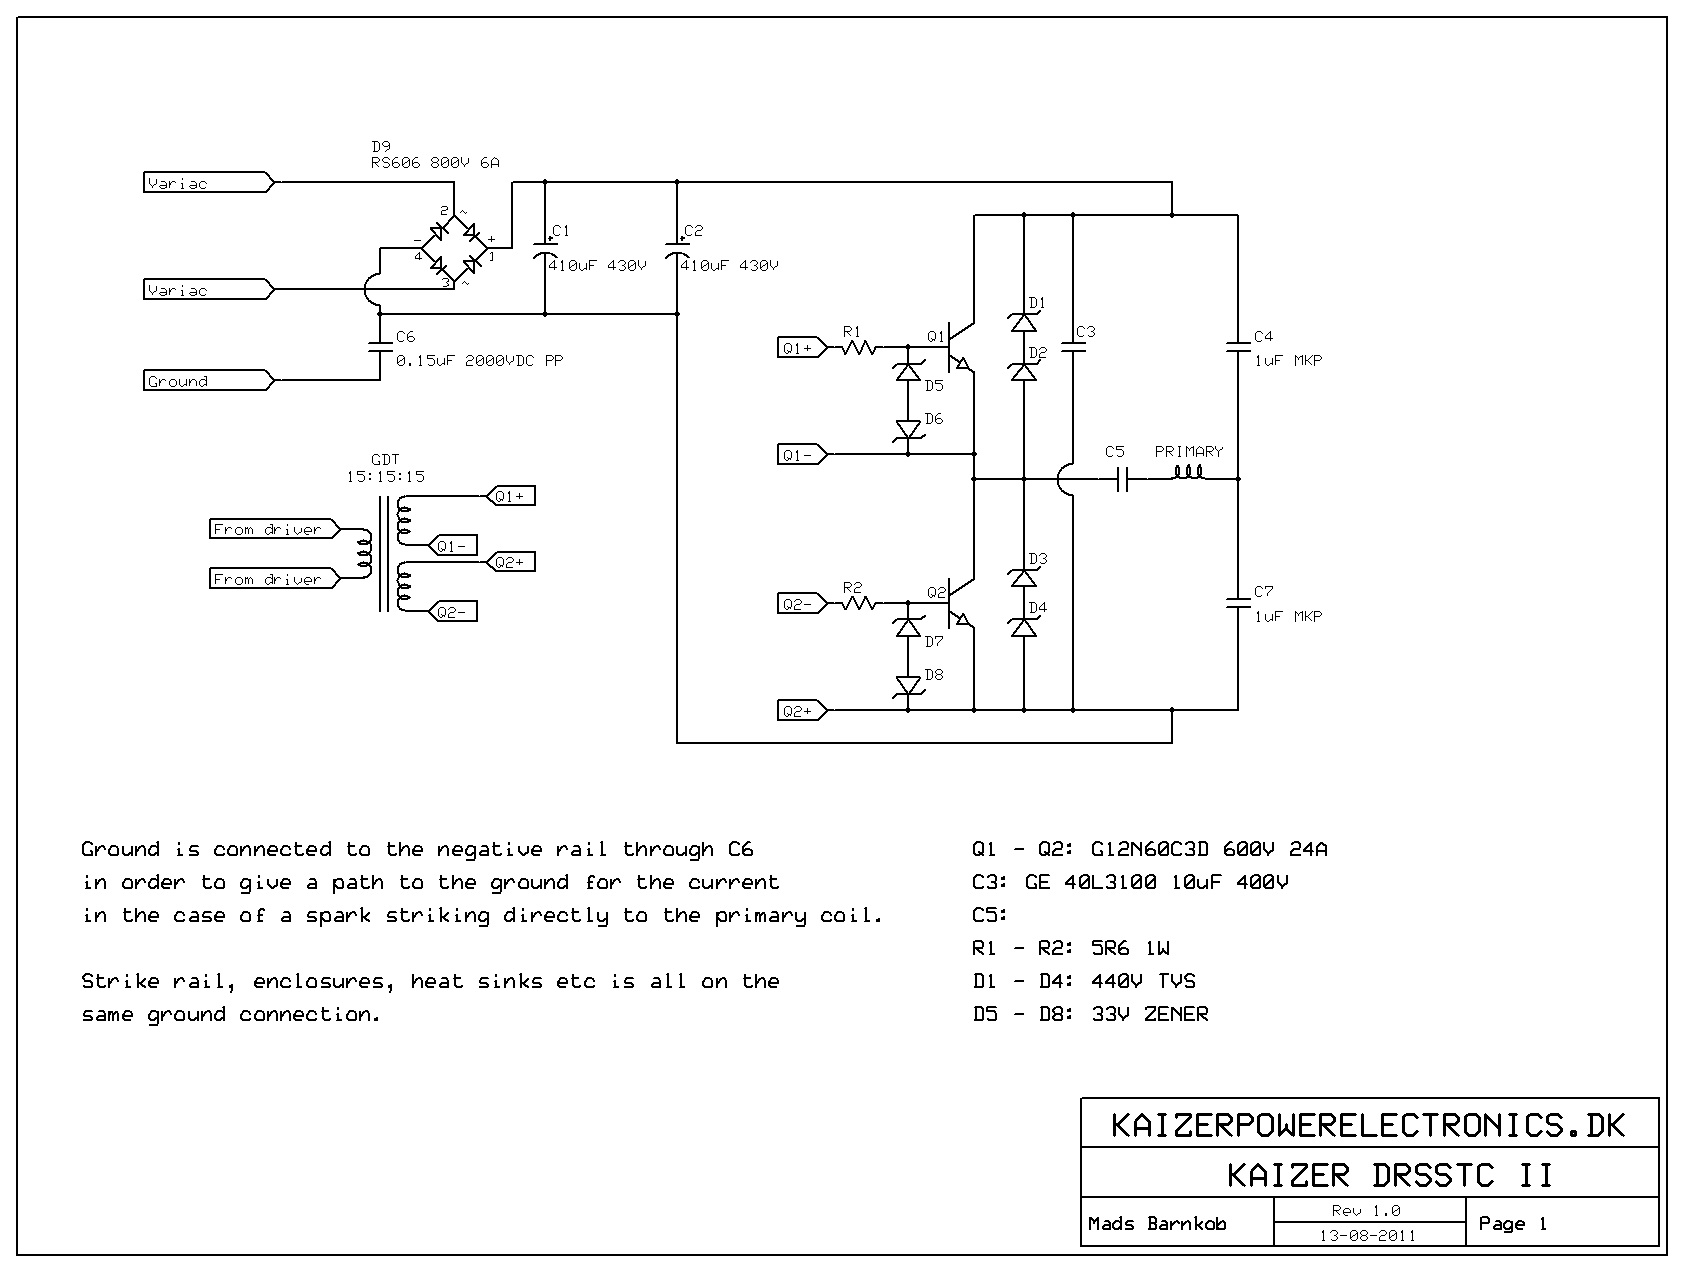 Kaizer DRSSTC II | Kaizer Power Electronics